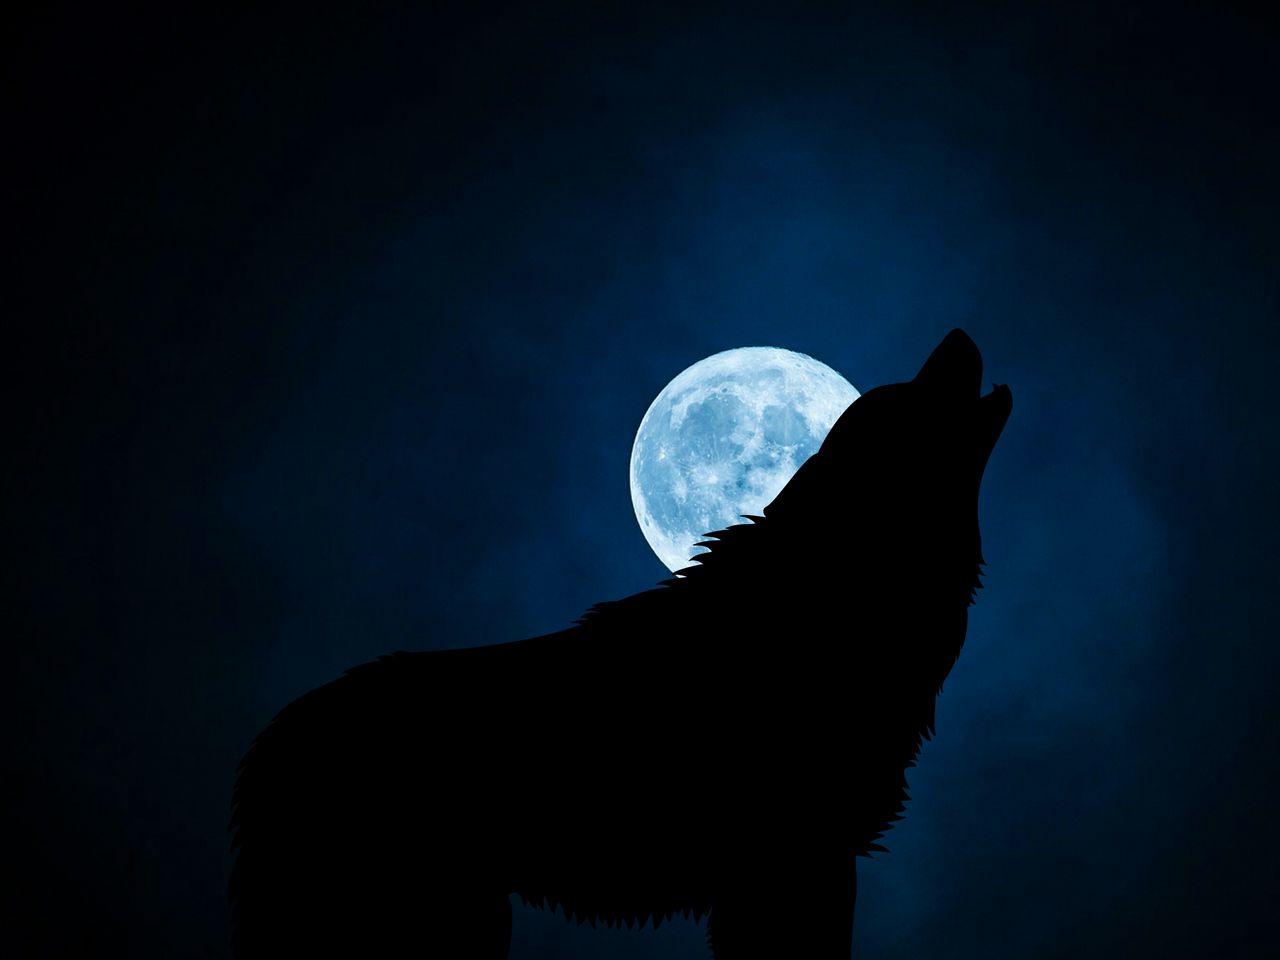 1280x960 Wallpaper wolf, silhouette, moon, night